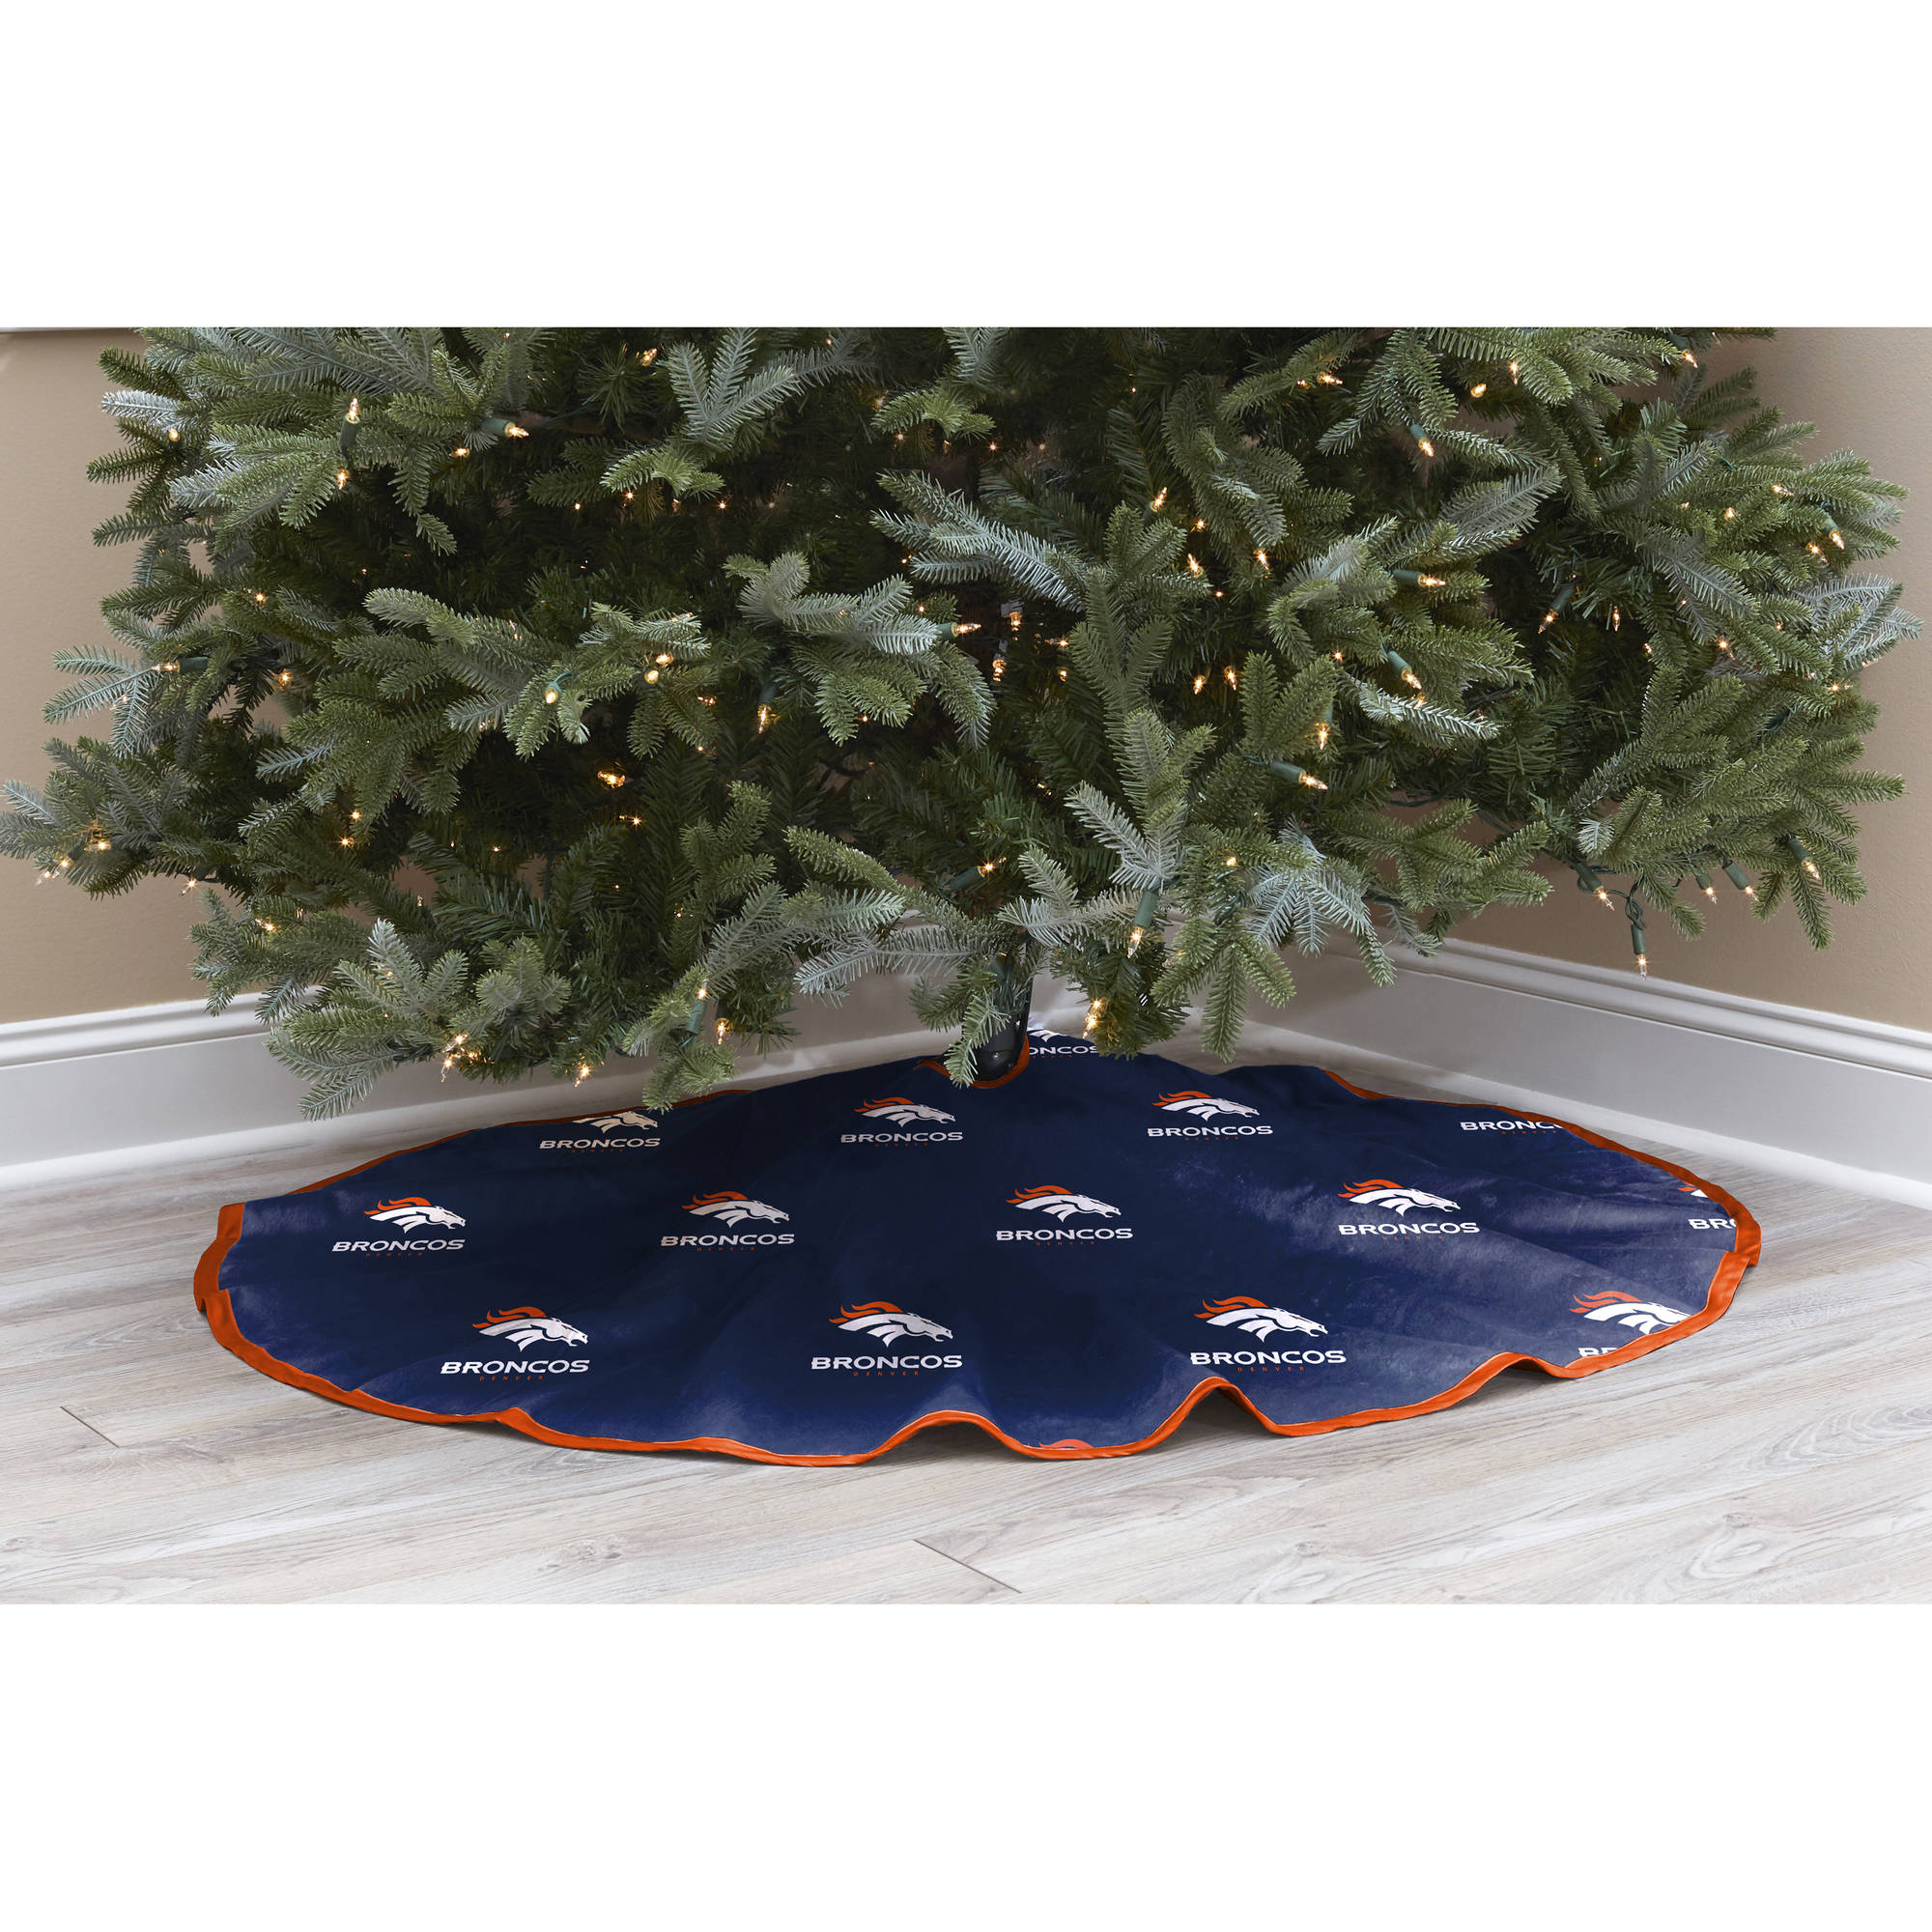 Tampa Bay Buccaneers Christmas Ornaments